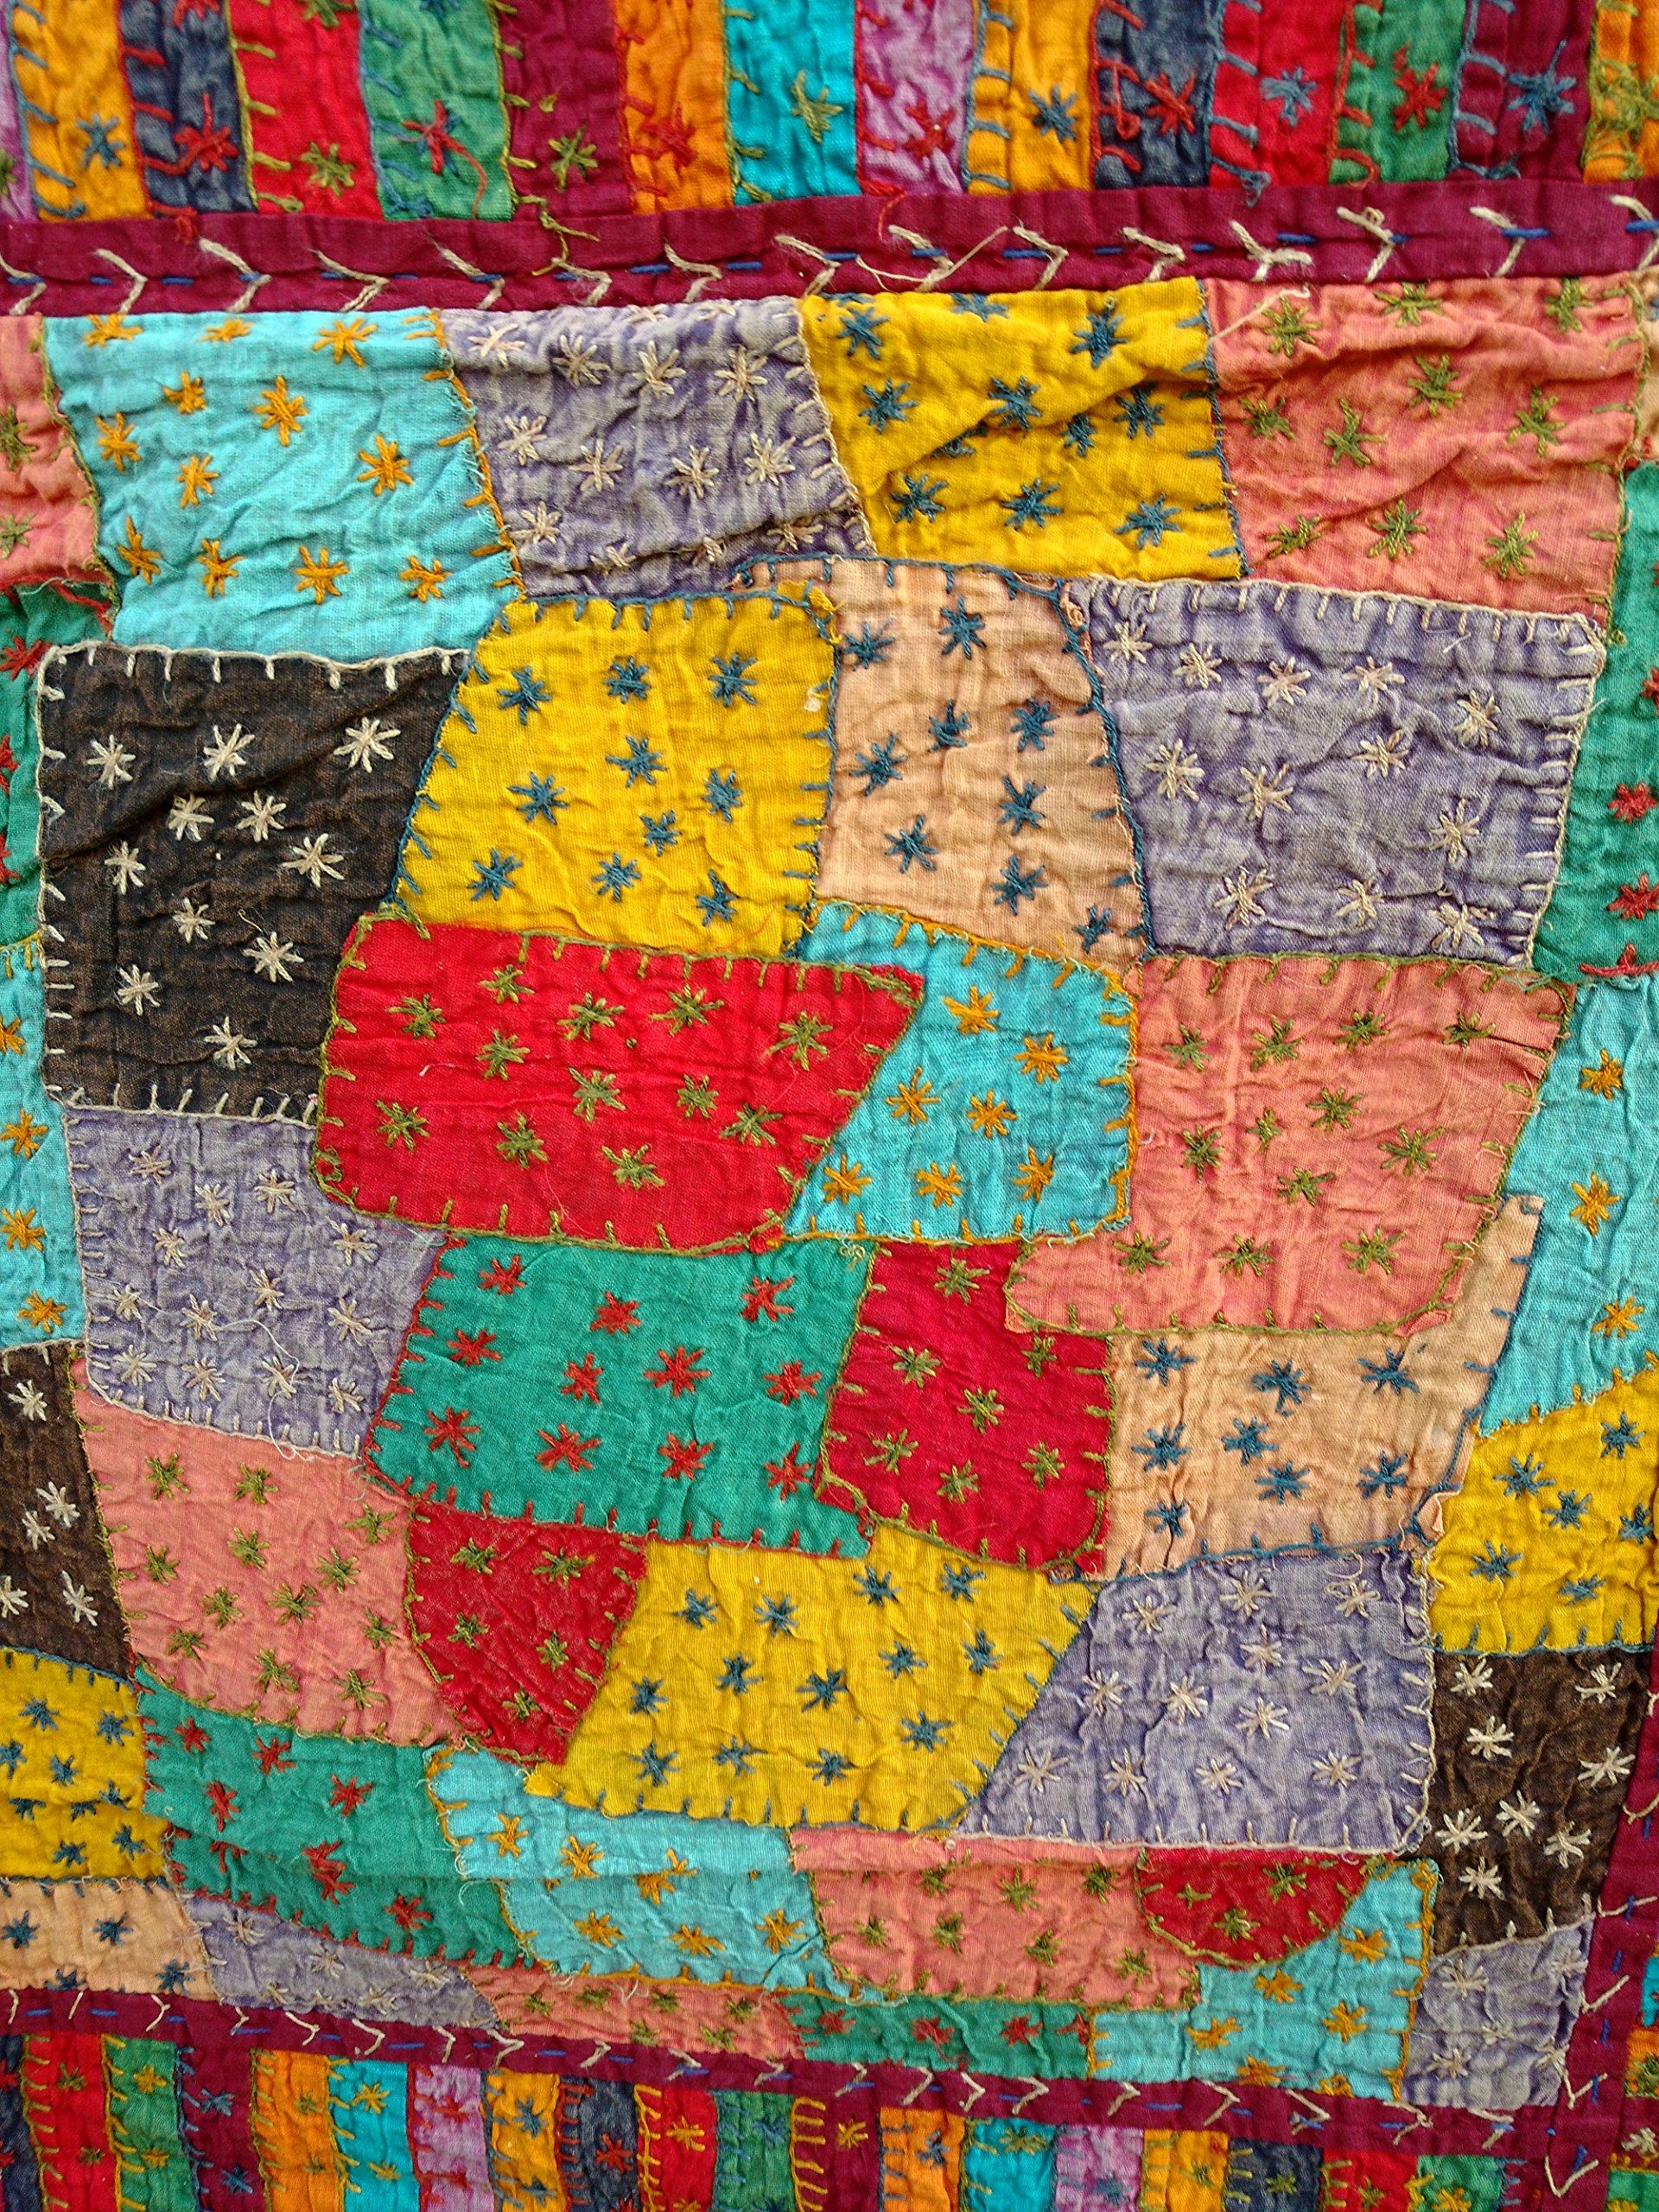 Rastogi Handicrafts India Ethnic Handmade Applique Jogi Work Cotton Double Bedcover Queen size Multi colored Bedsheet cover (MULTI COLOR 20 BOXES) by Rastogi Handicrafts (Image #4)